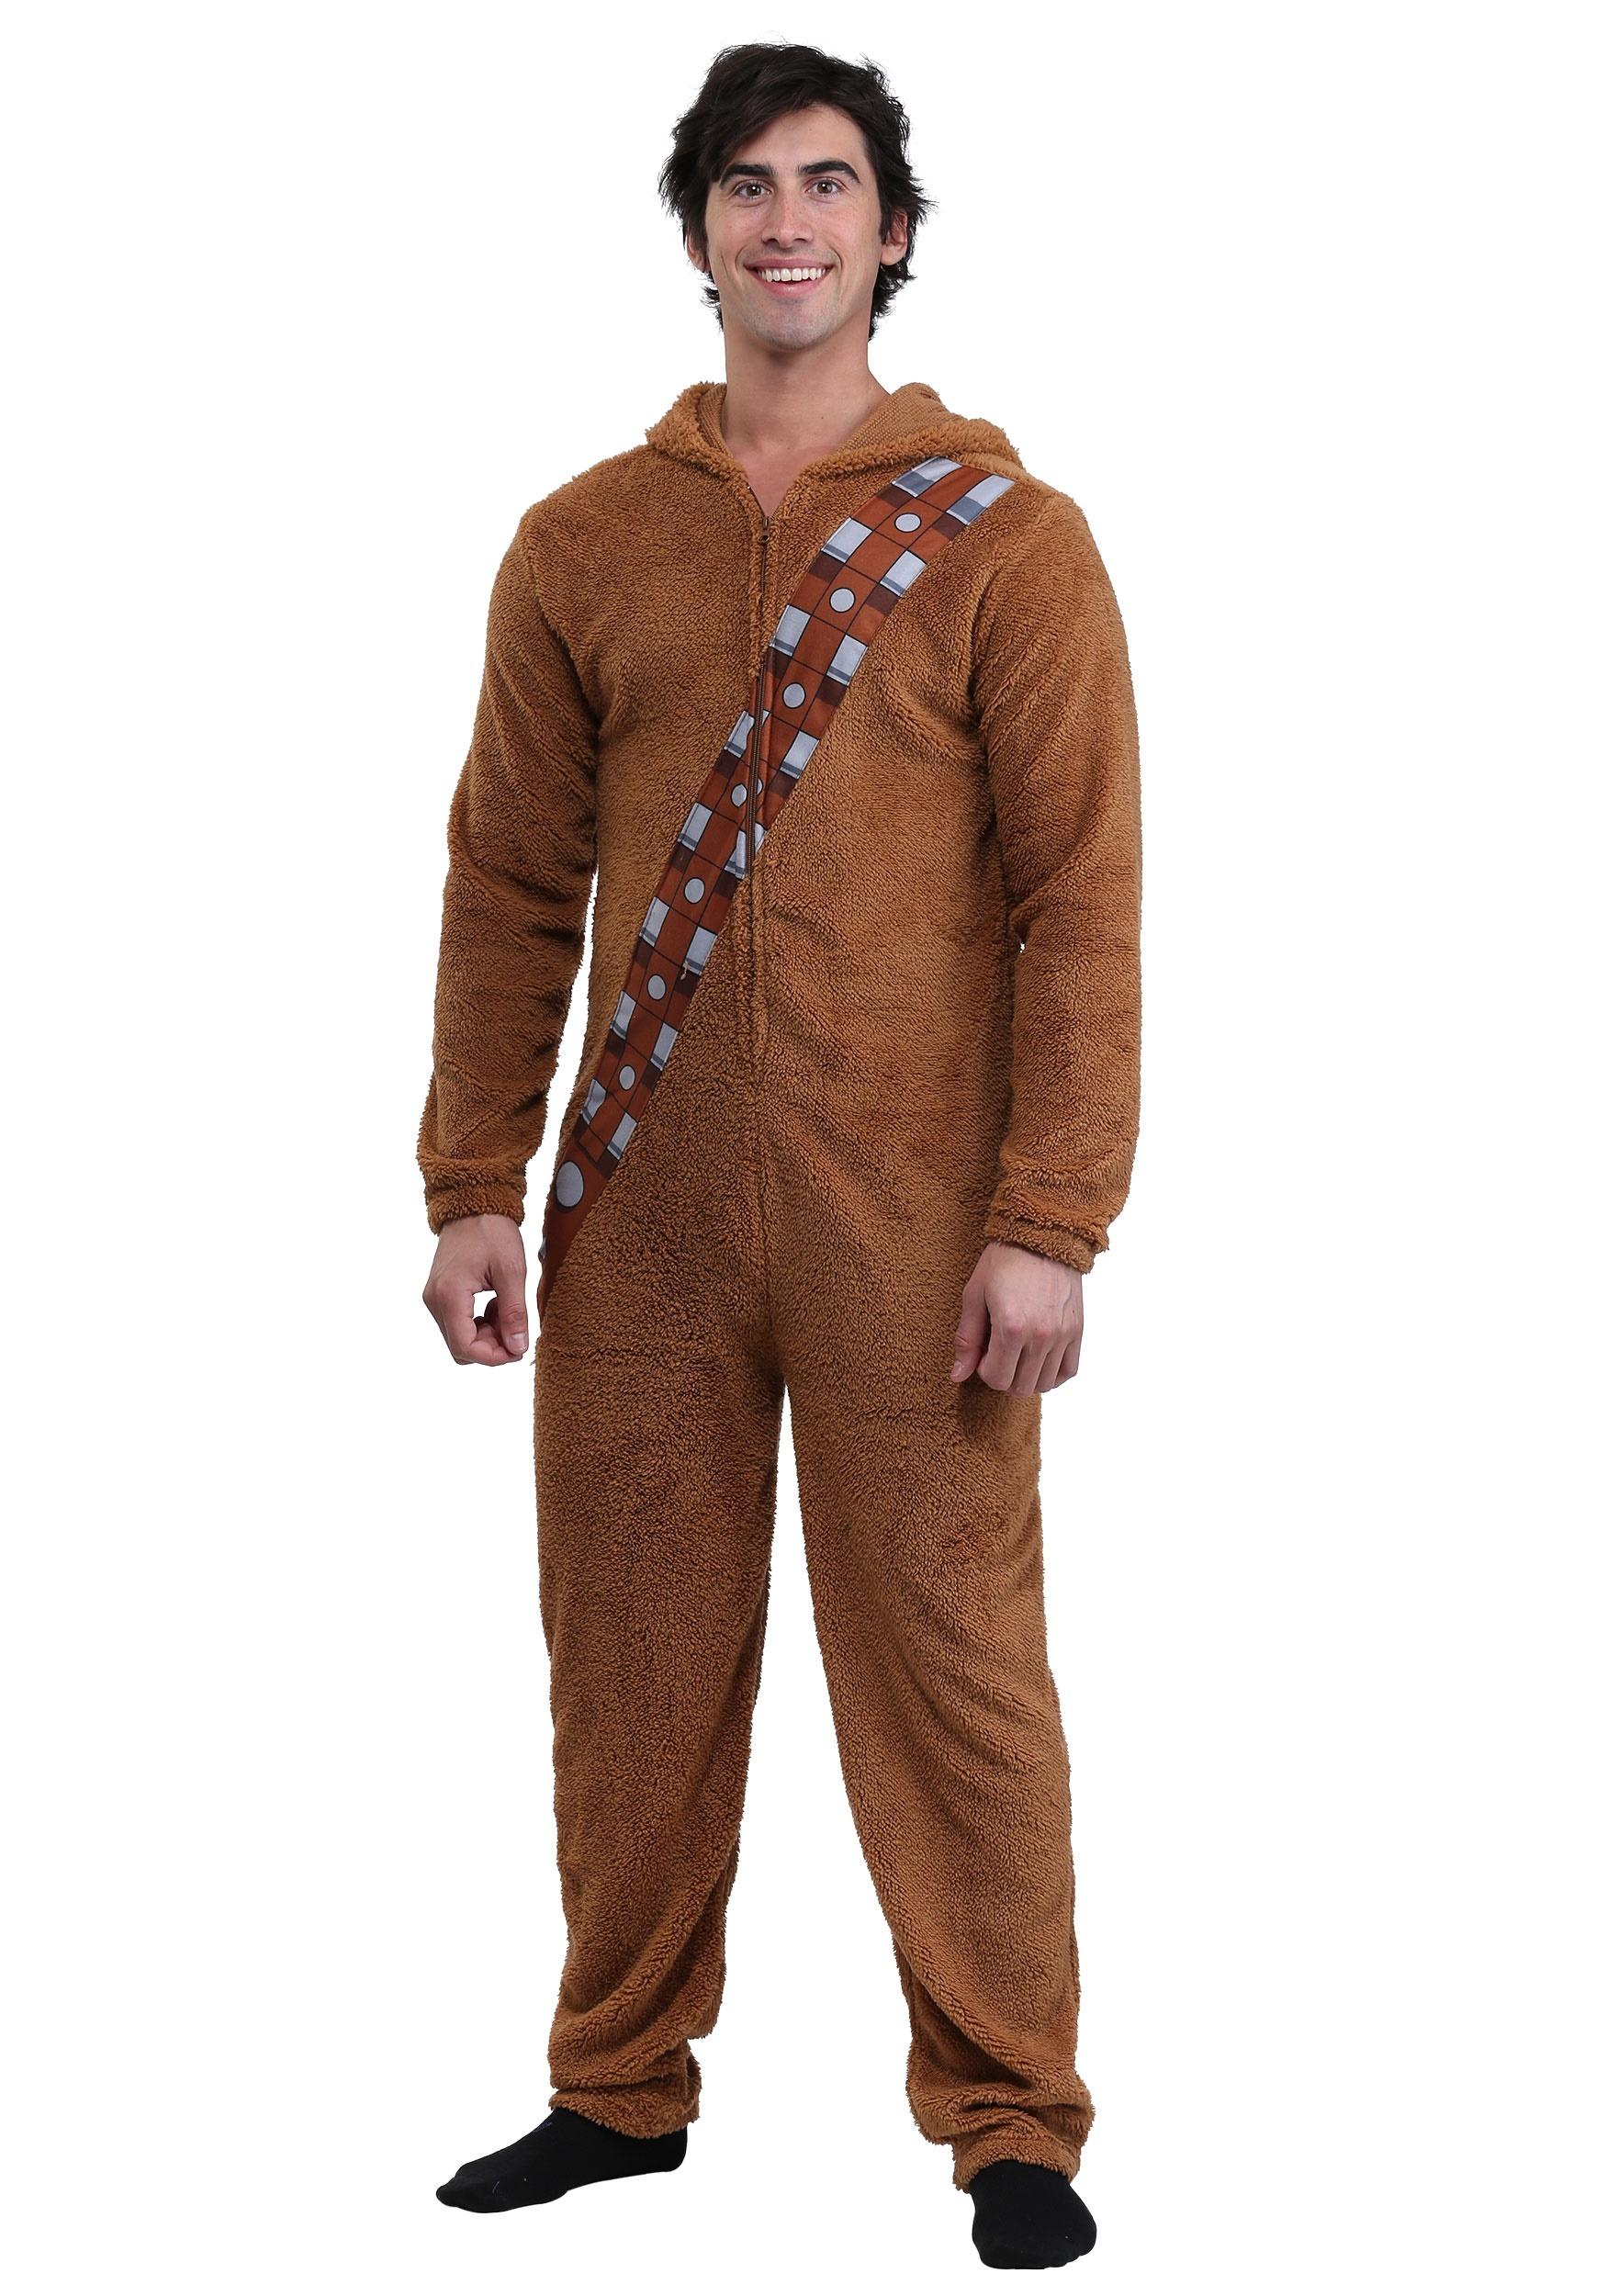 510ce26b5d Star Wars Chewbacca Adult Onesie